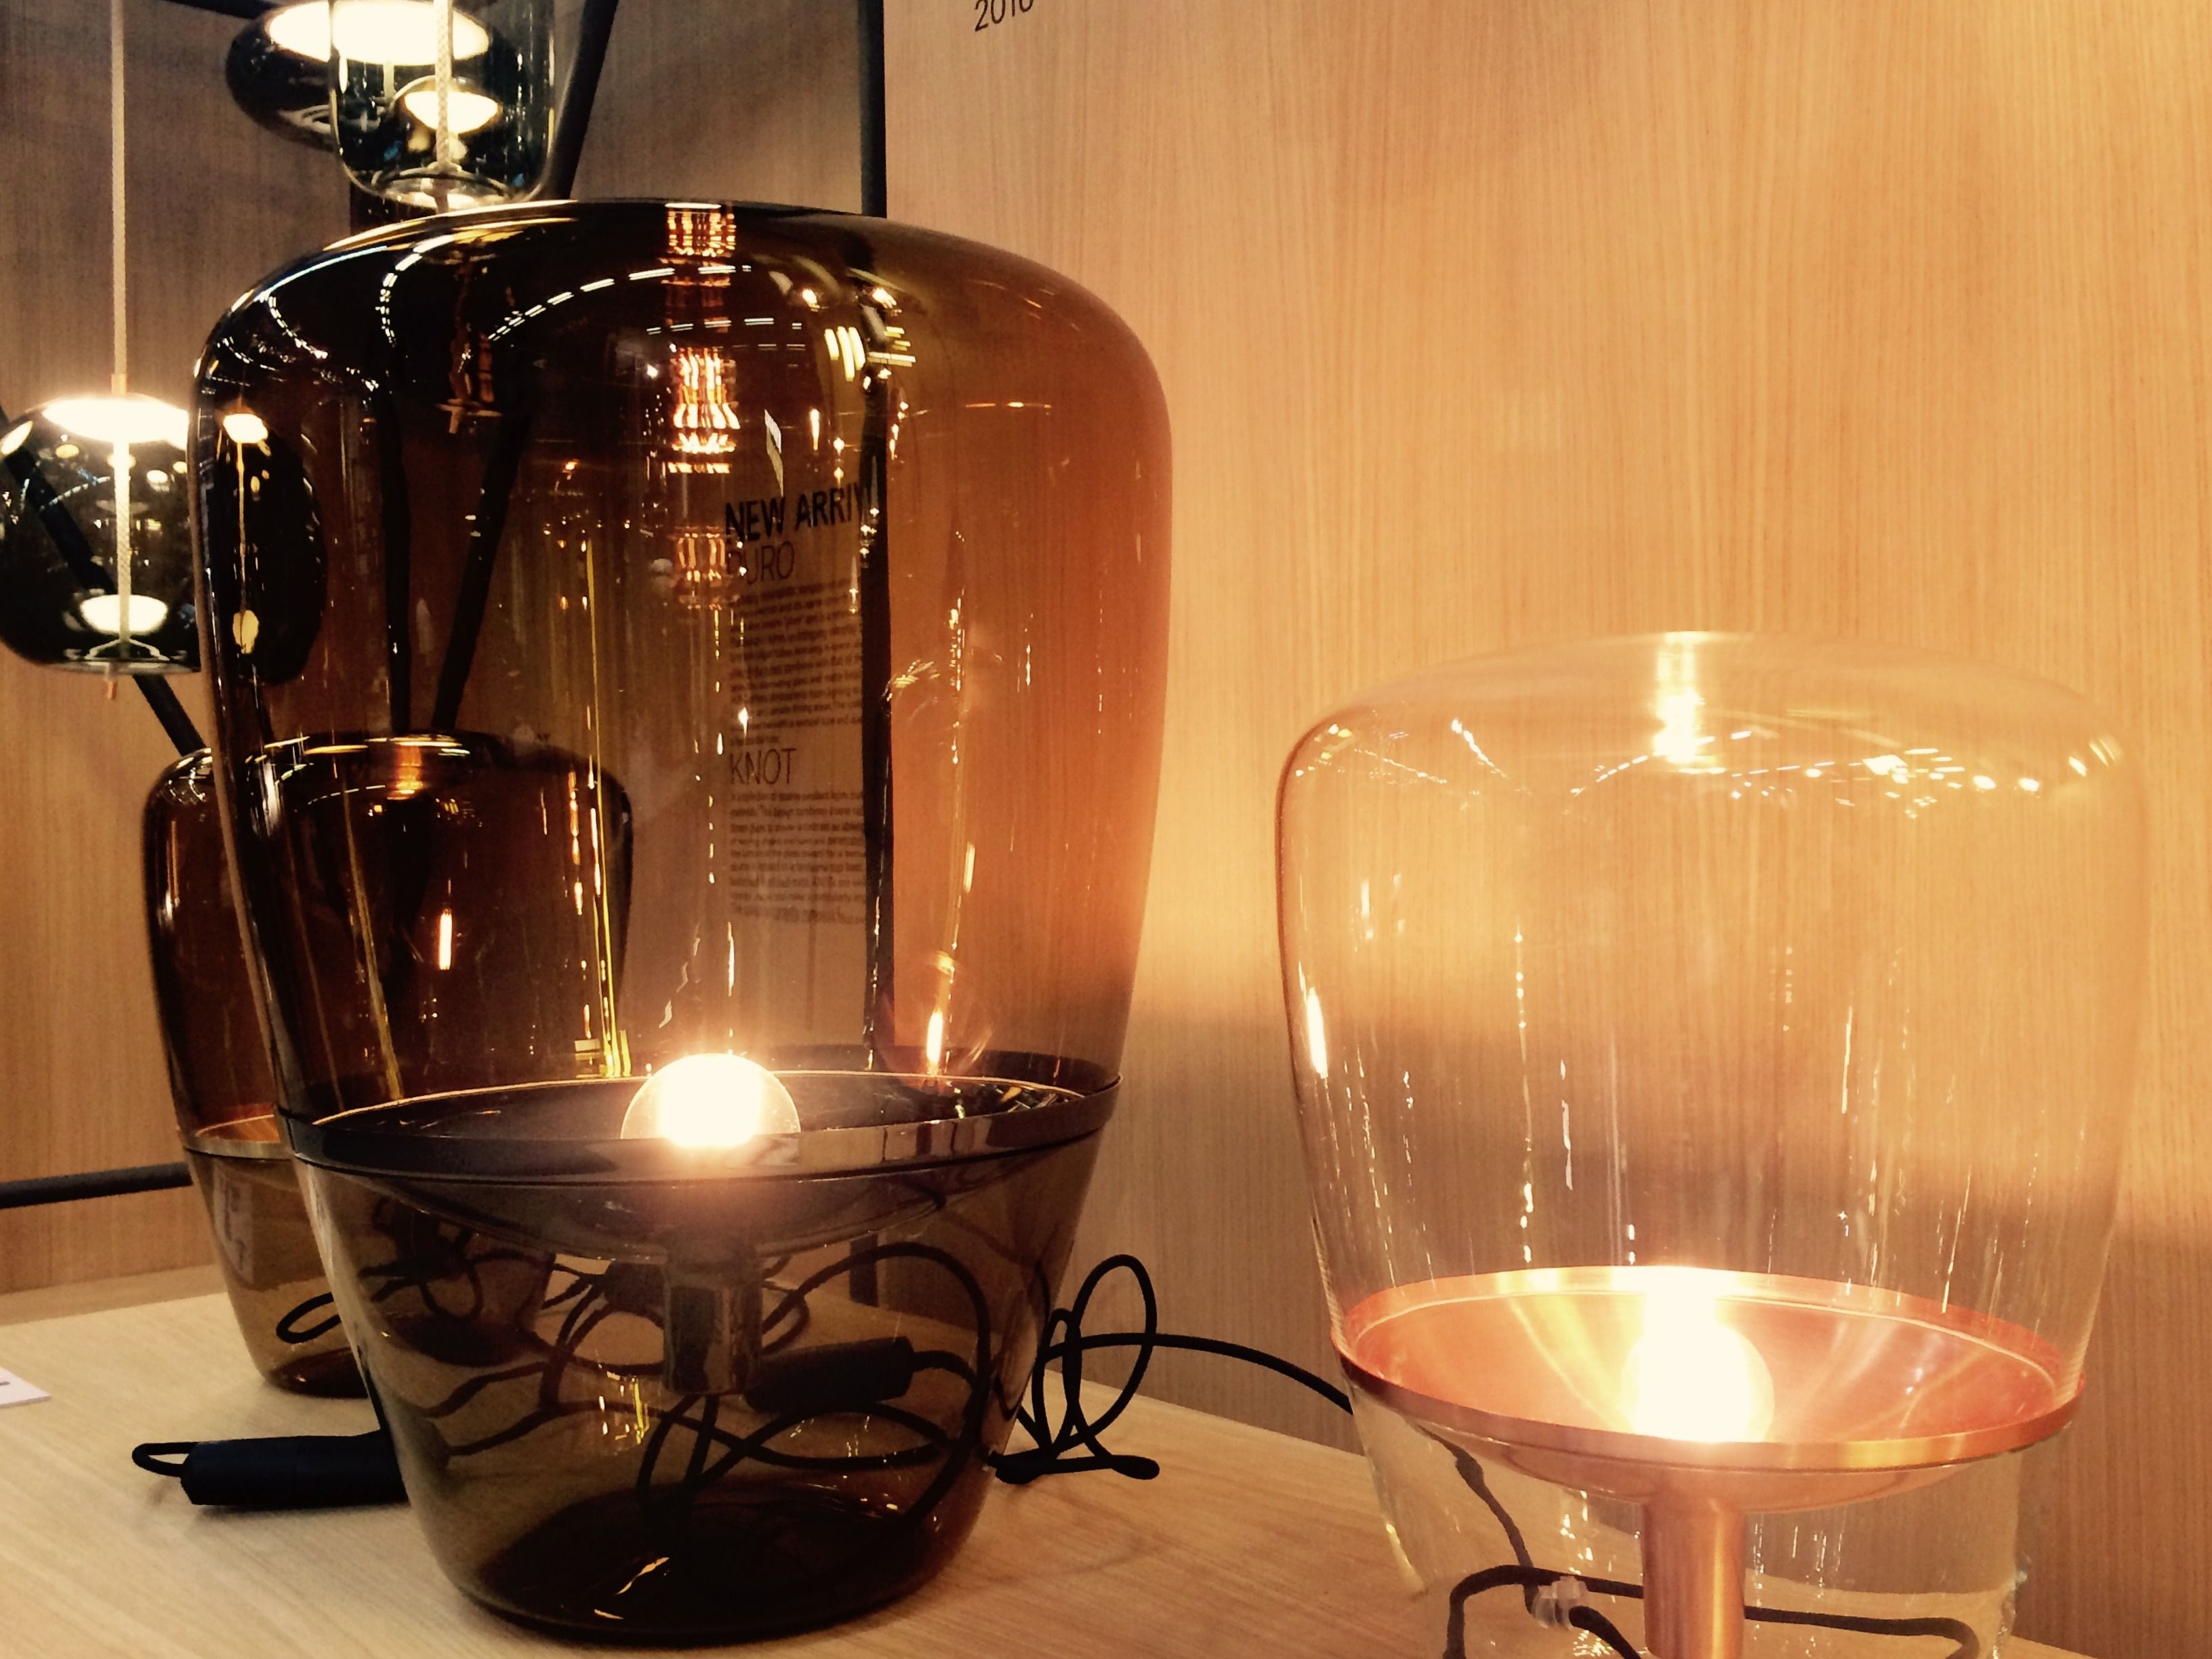 Dan Yeffet & Lucie Koldova stockholm furniture fair - brokis - lights - interior